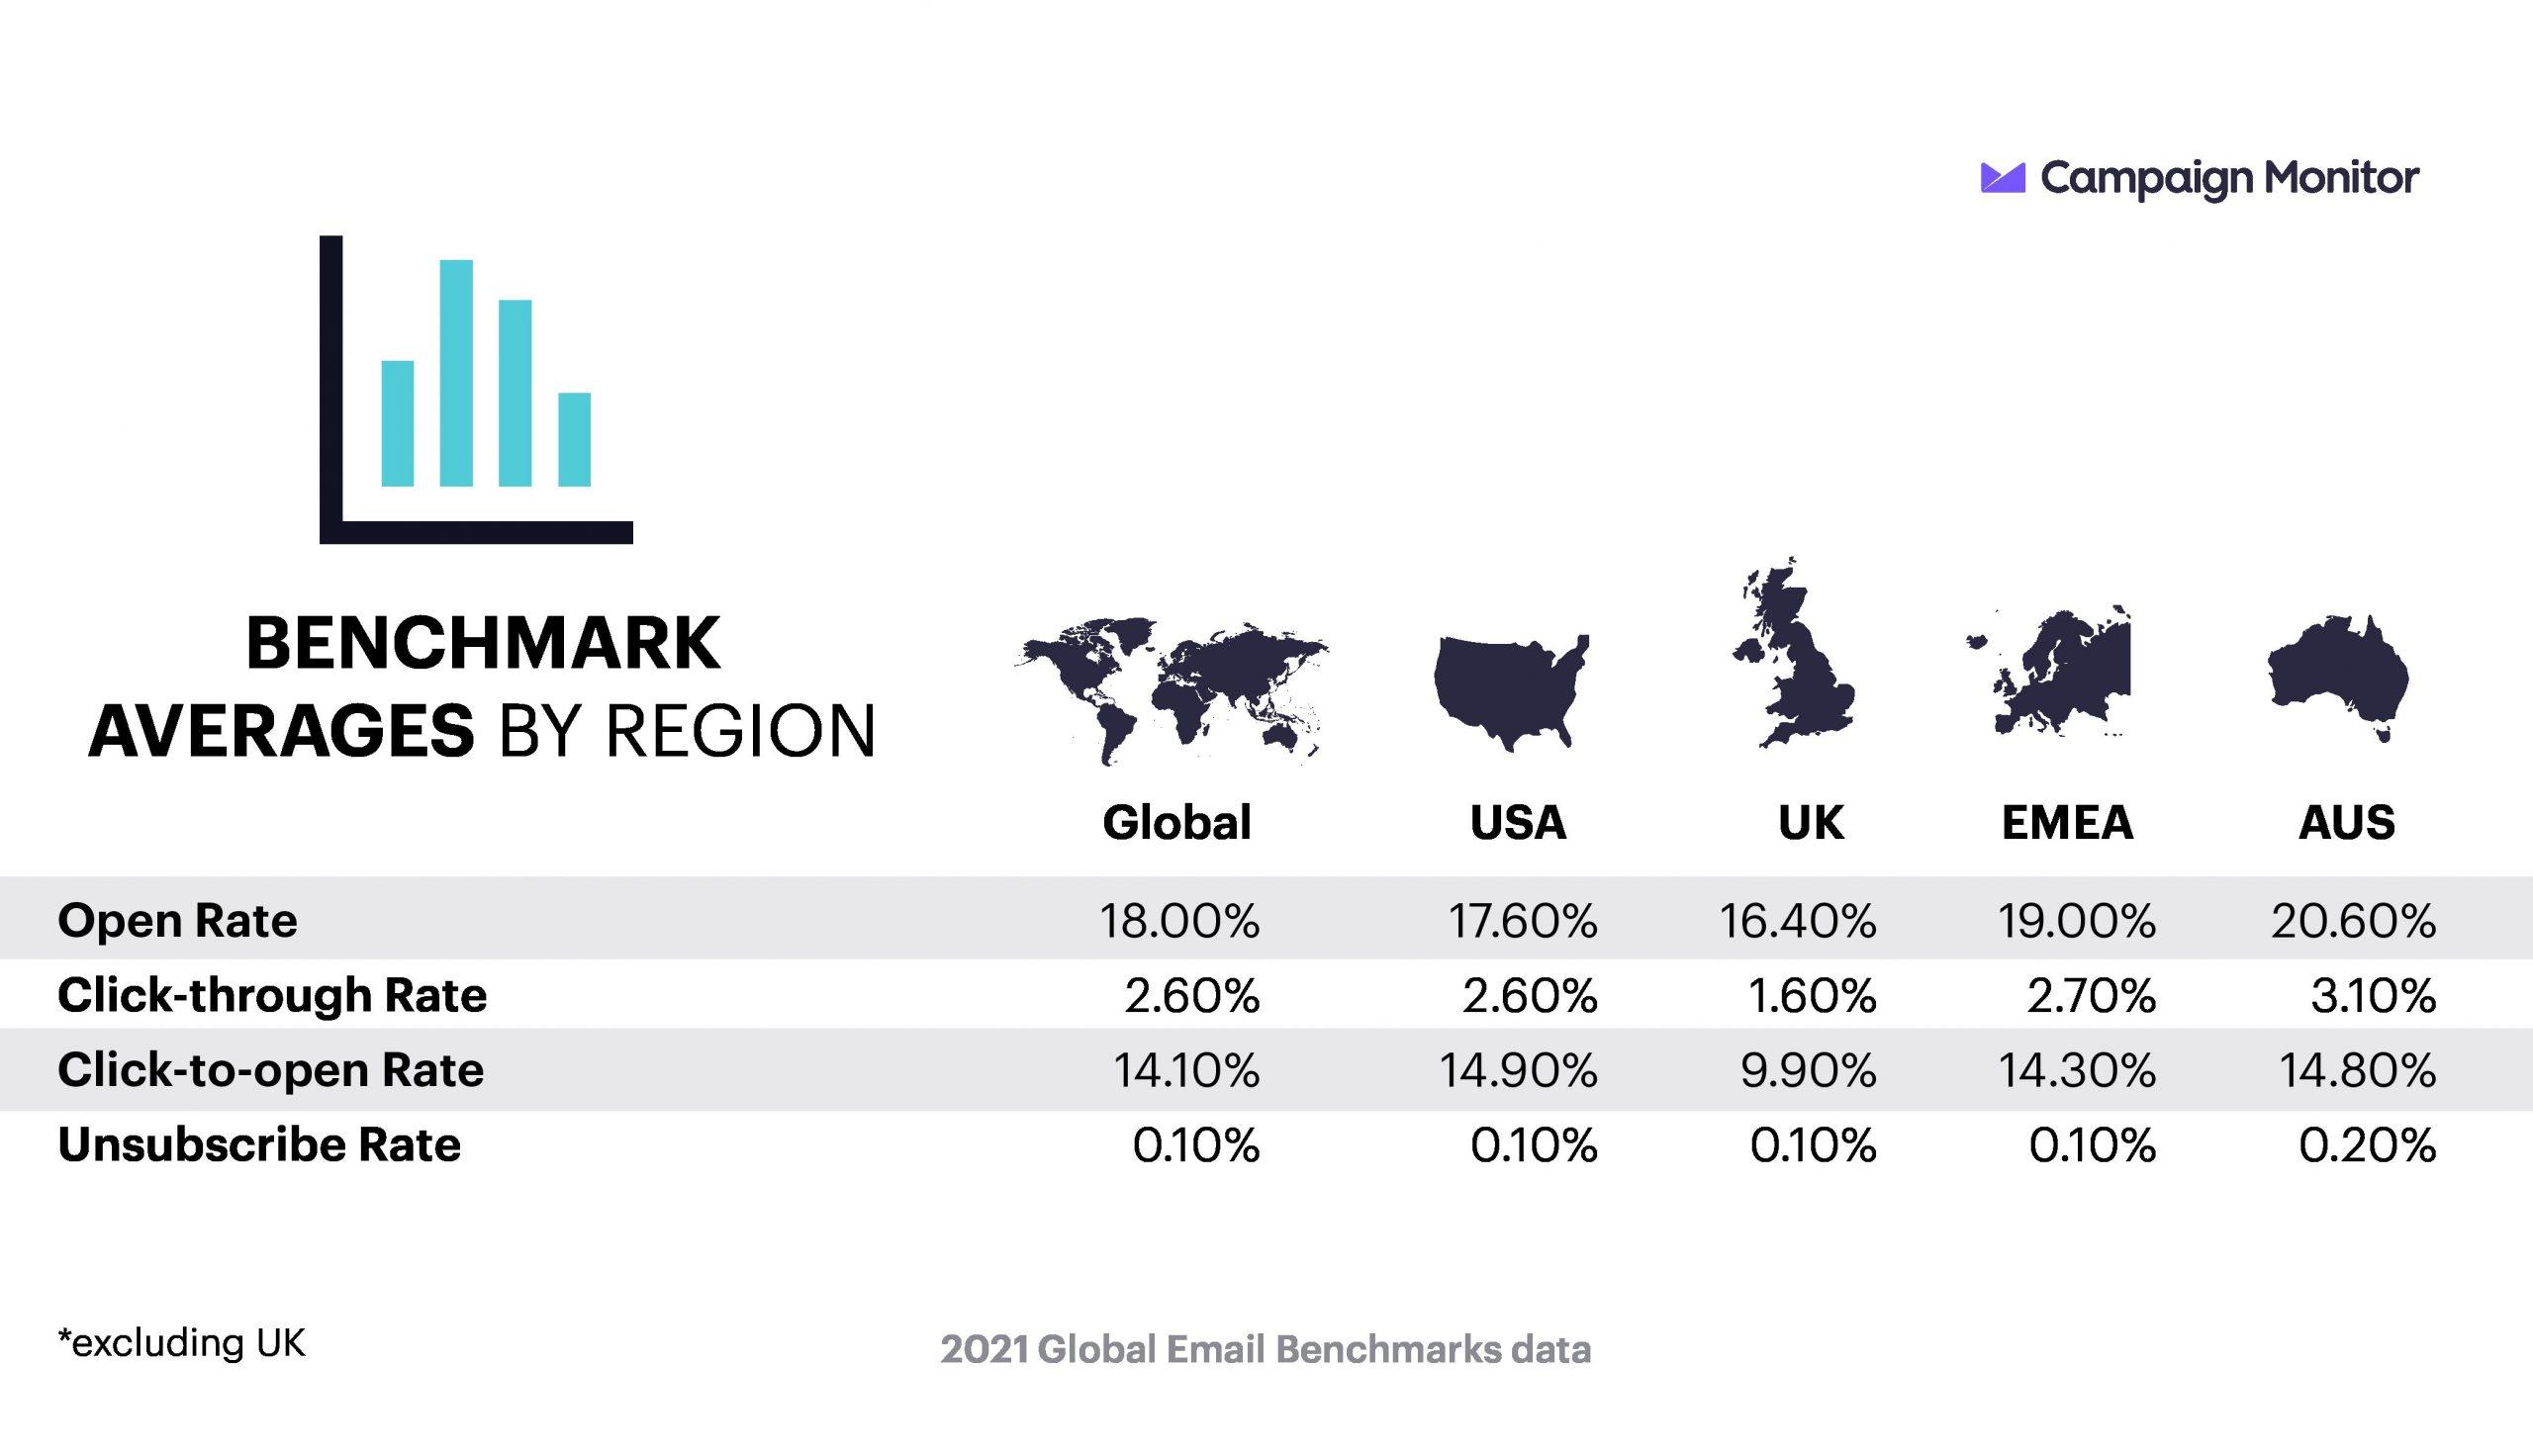 Benchmarks level by Region